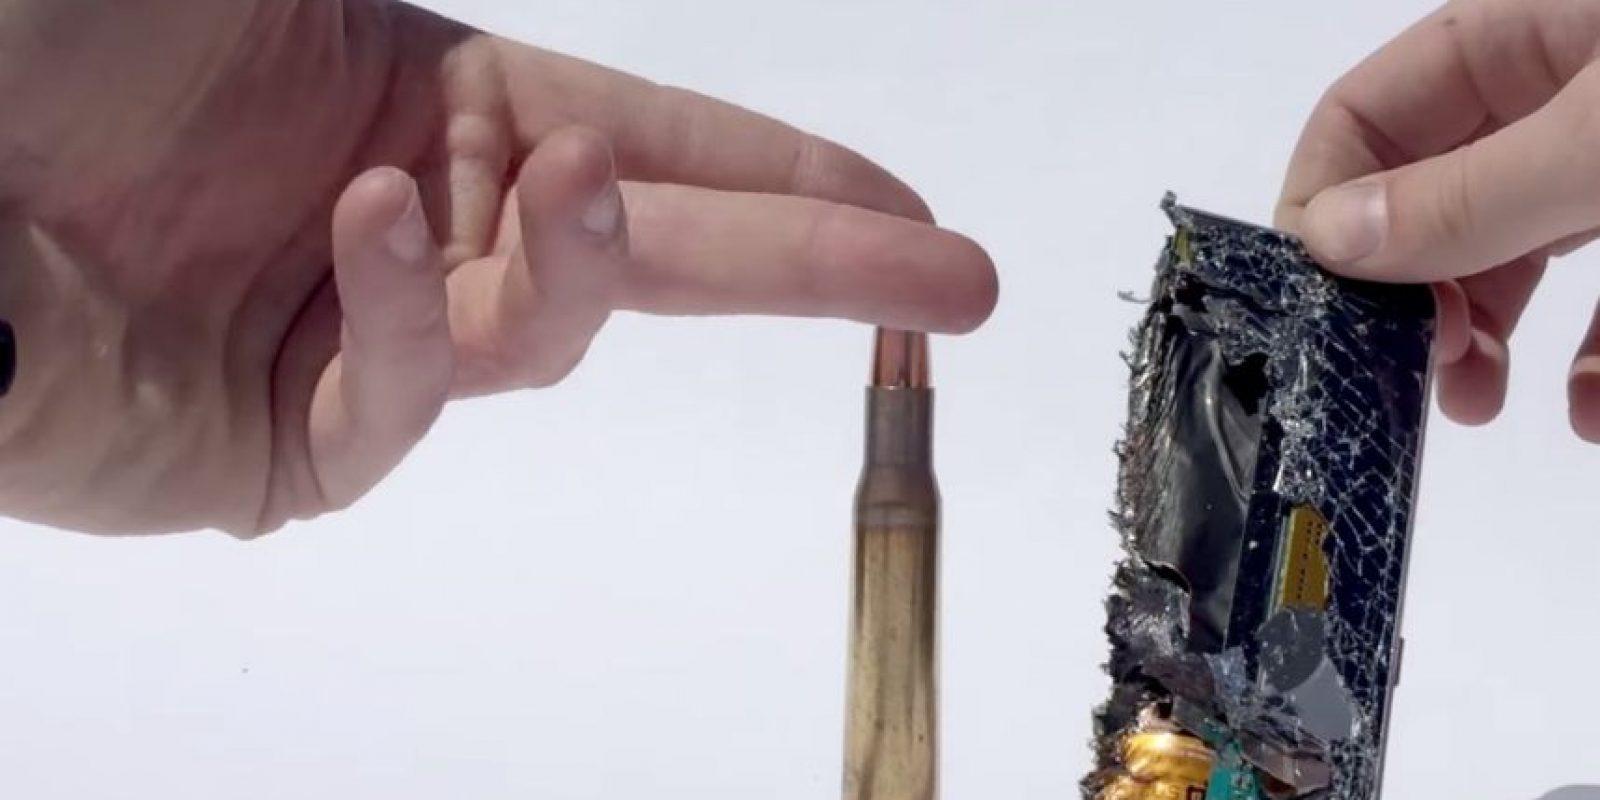 El impacto de bala quemó sus componentes. Foto:FullMag